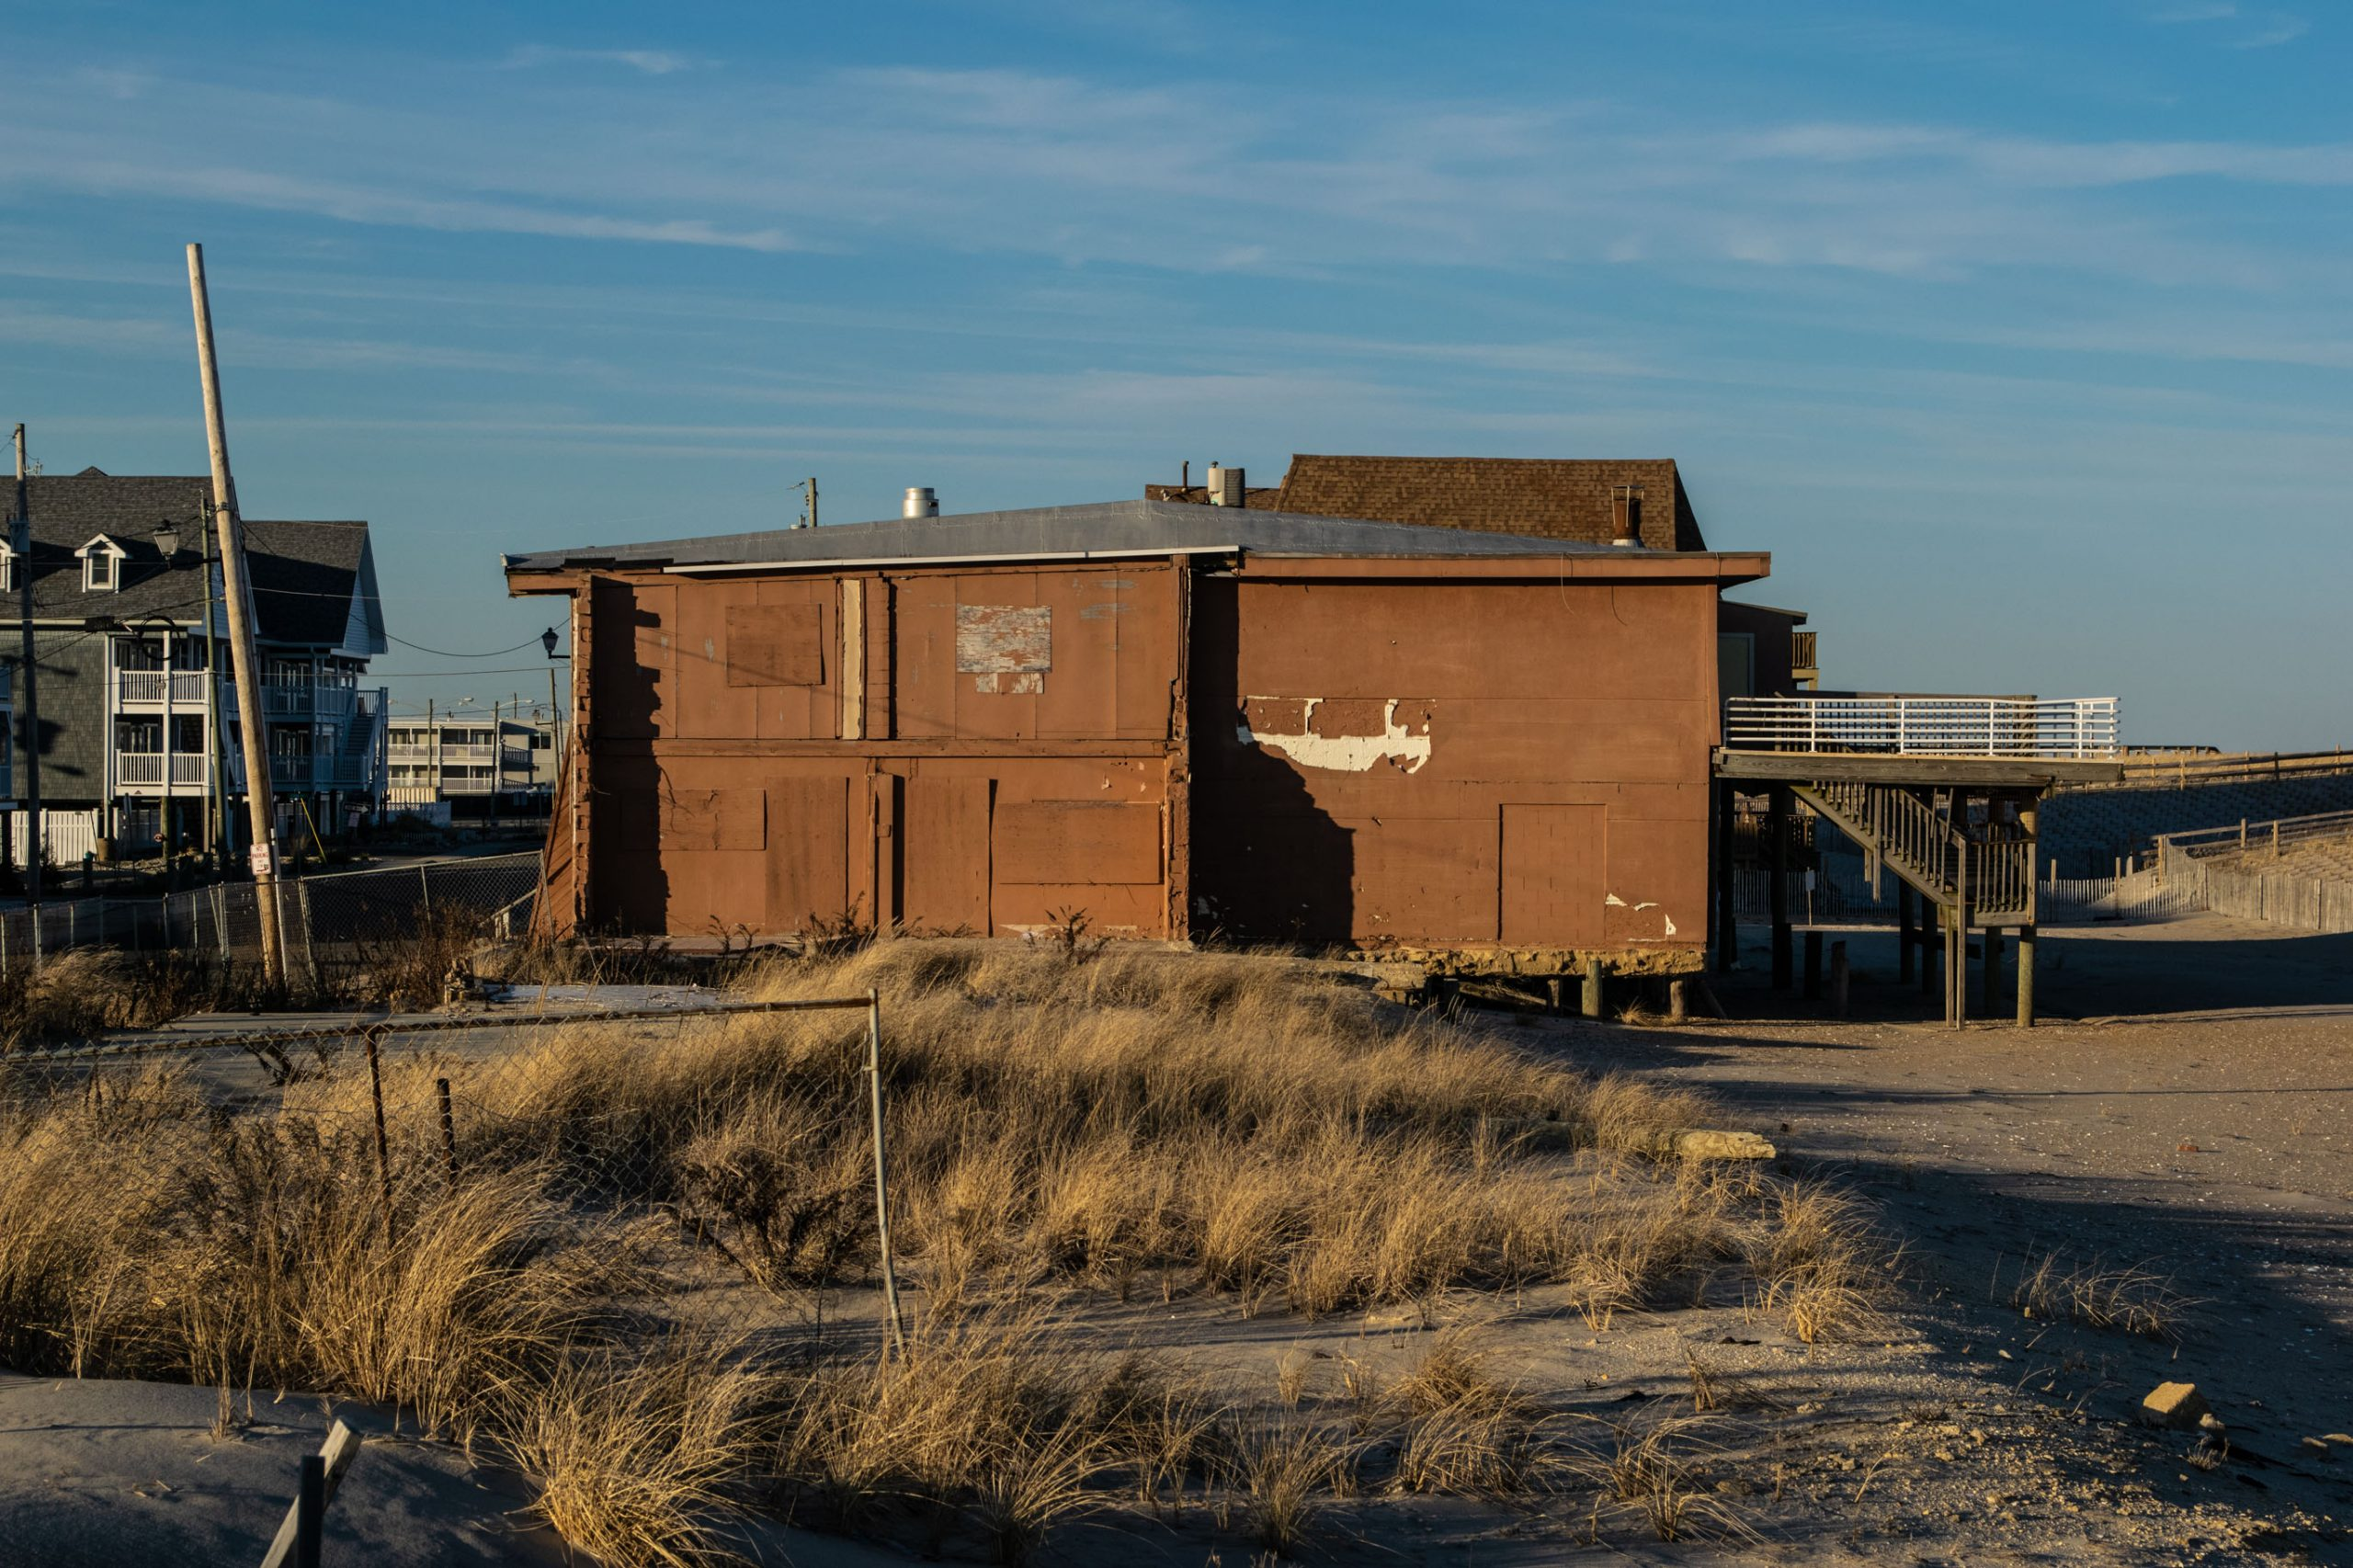 The former Joey Harrison's Surf Club, Ortley Beach, Feb. 2020. (Photo: Daniel Nee)